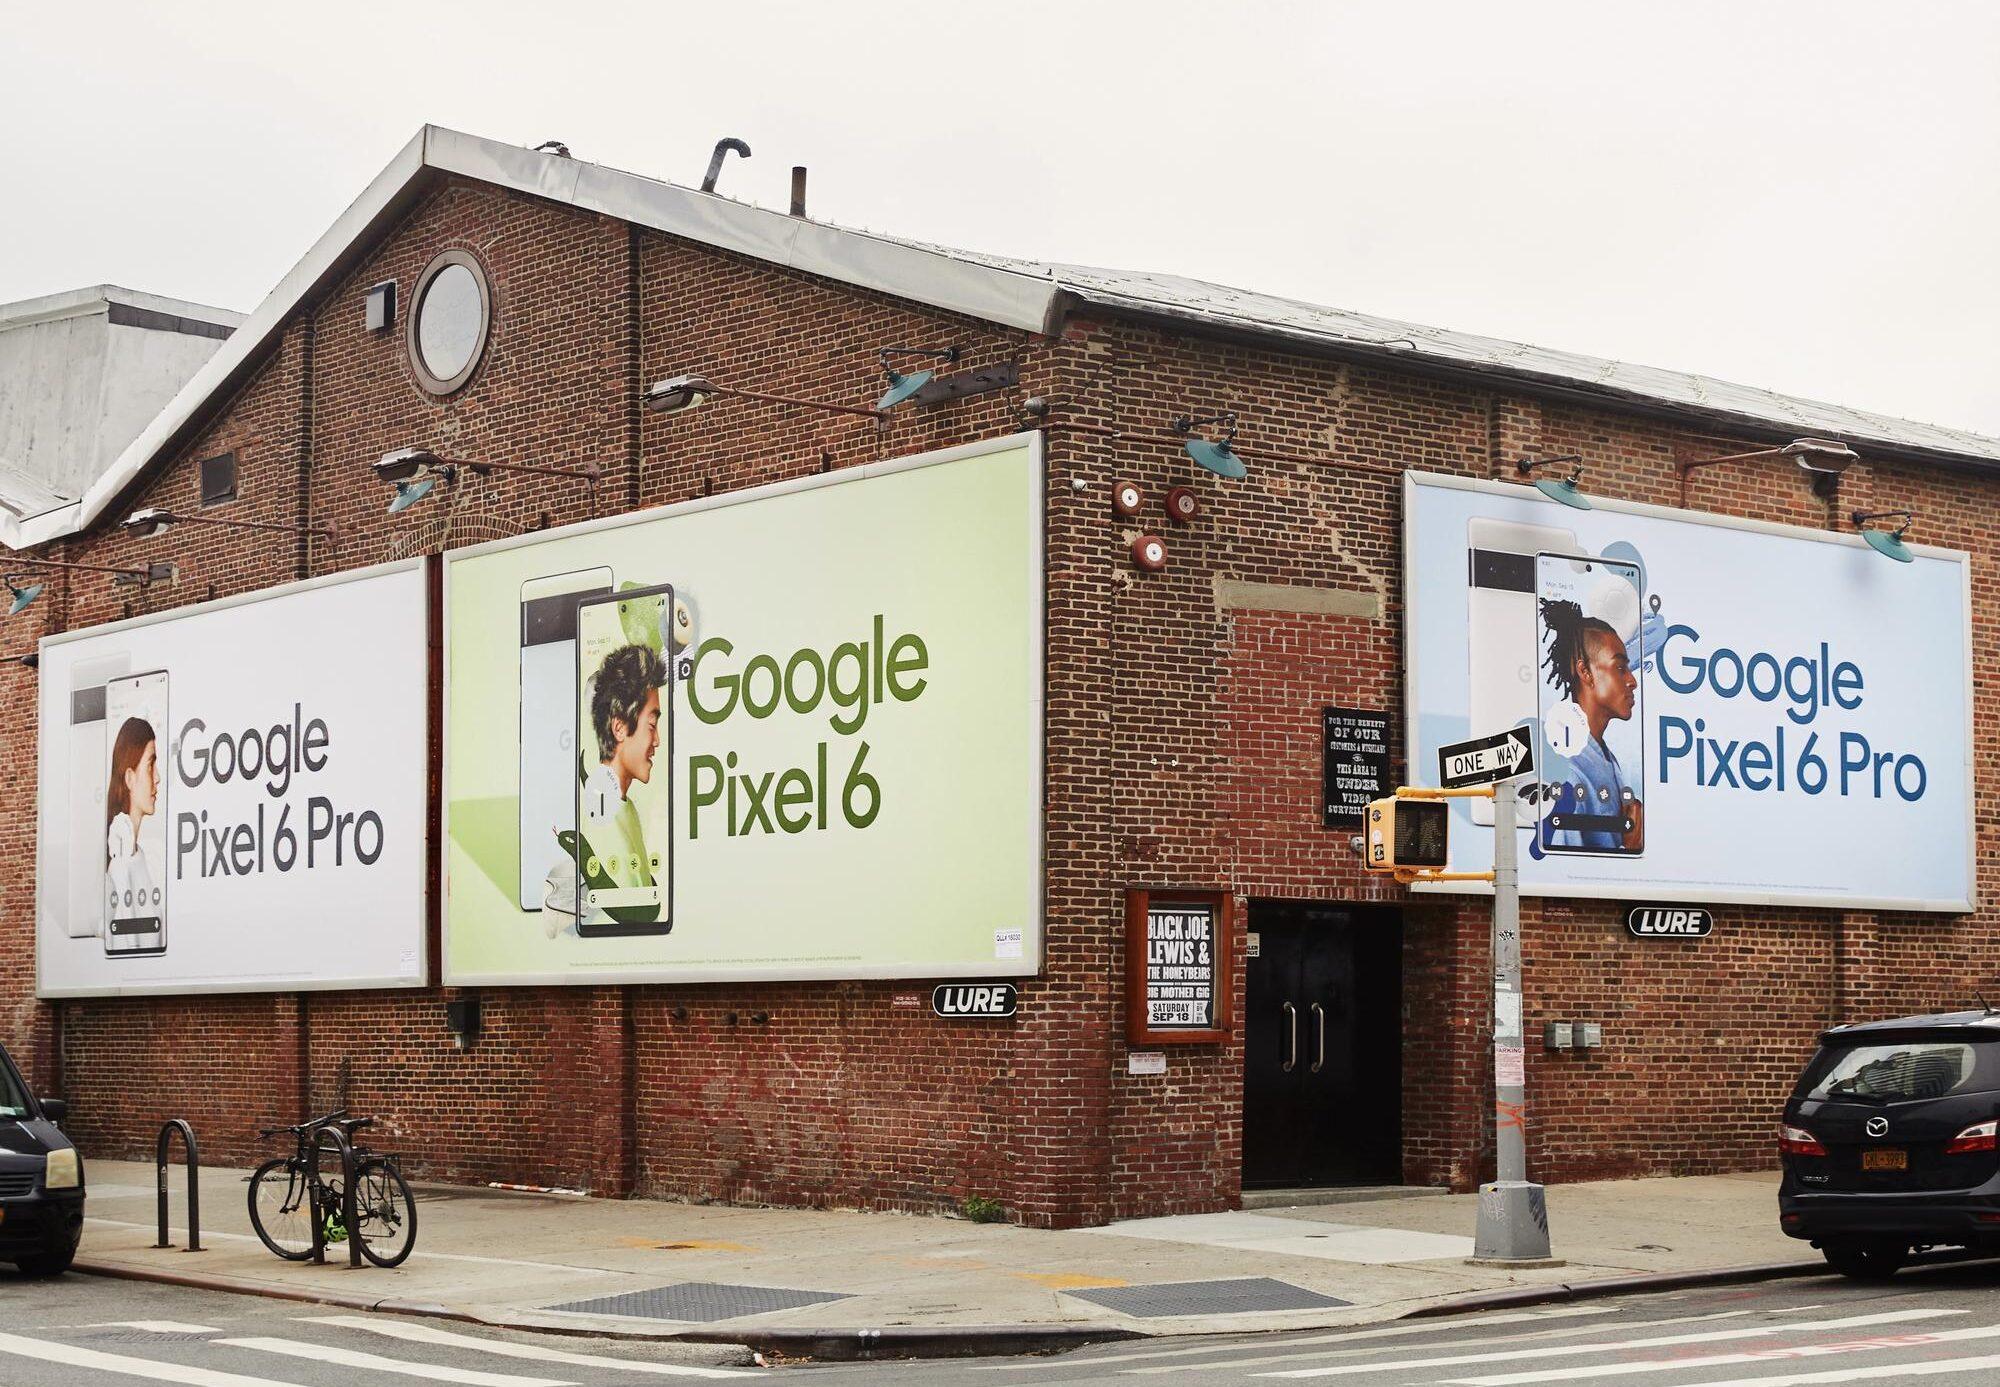 Ecco le immagini più belle di Google Pixel 6 e Google Pixel 6